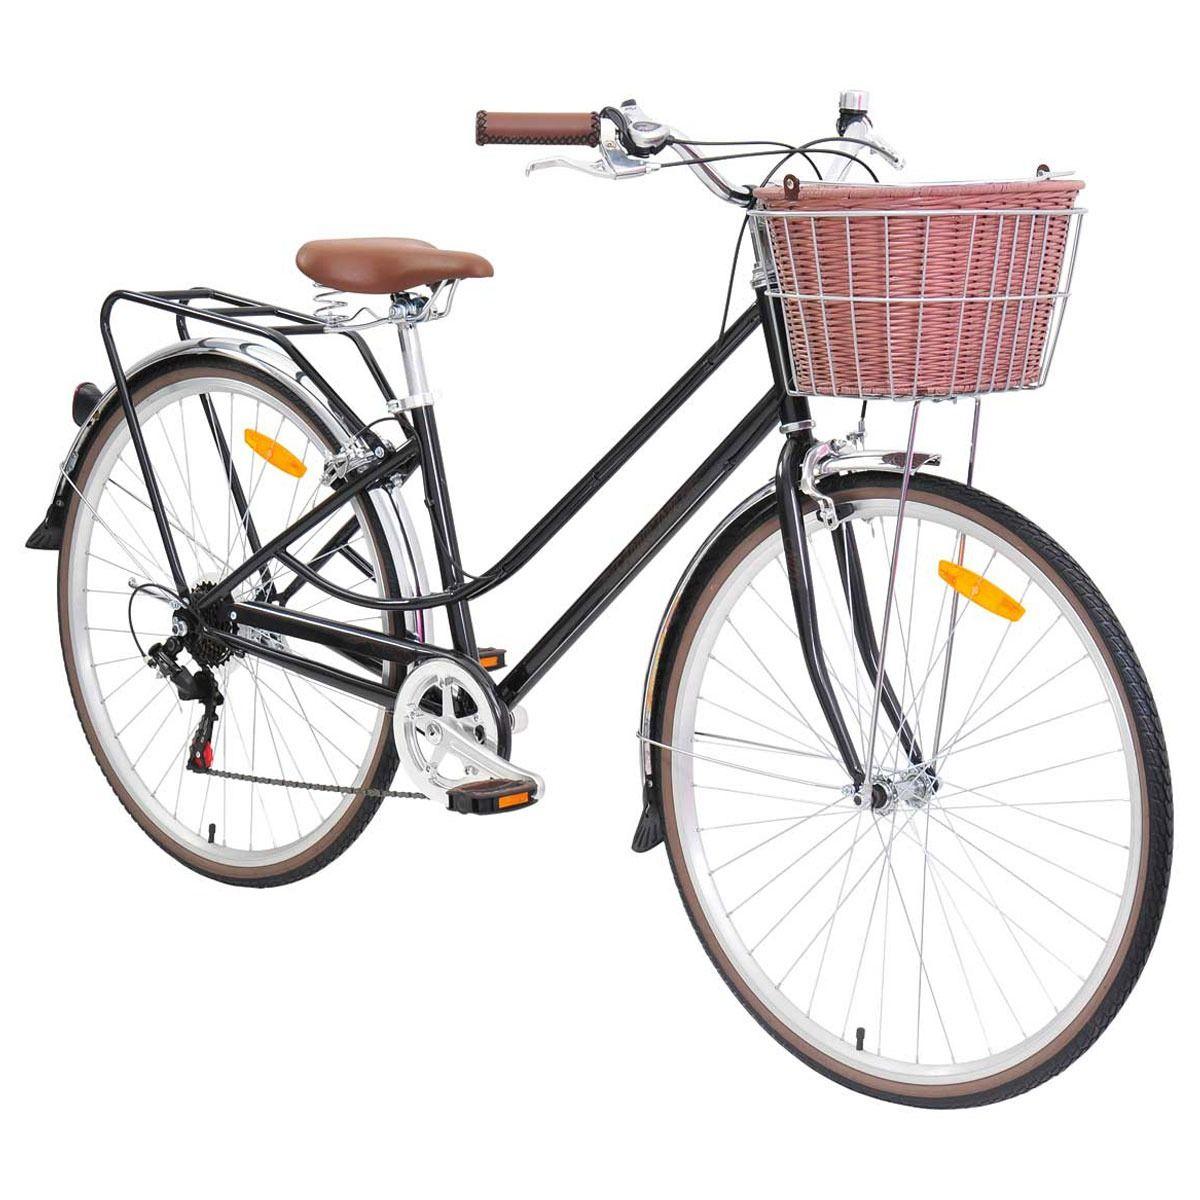 Vintage style Zeus Cycling Bidon